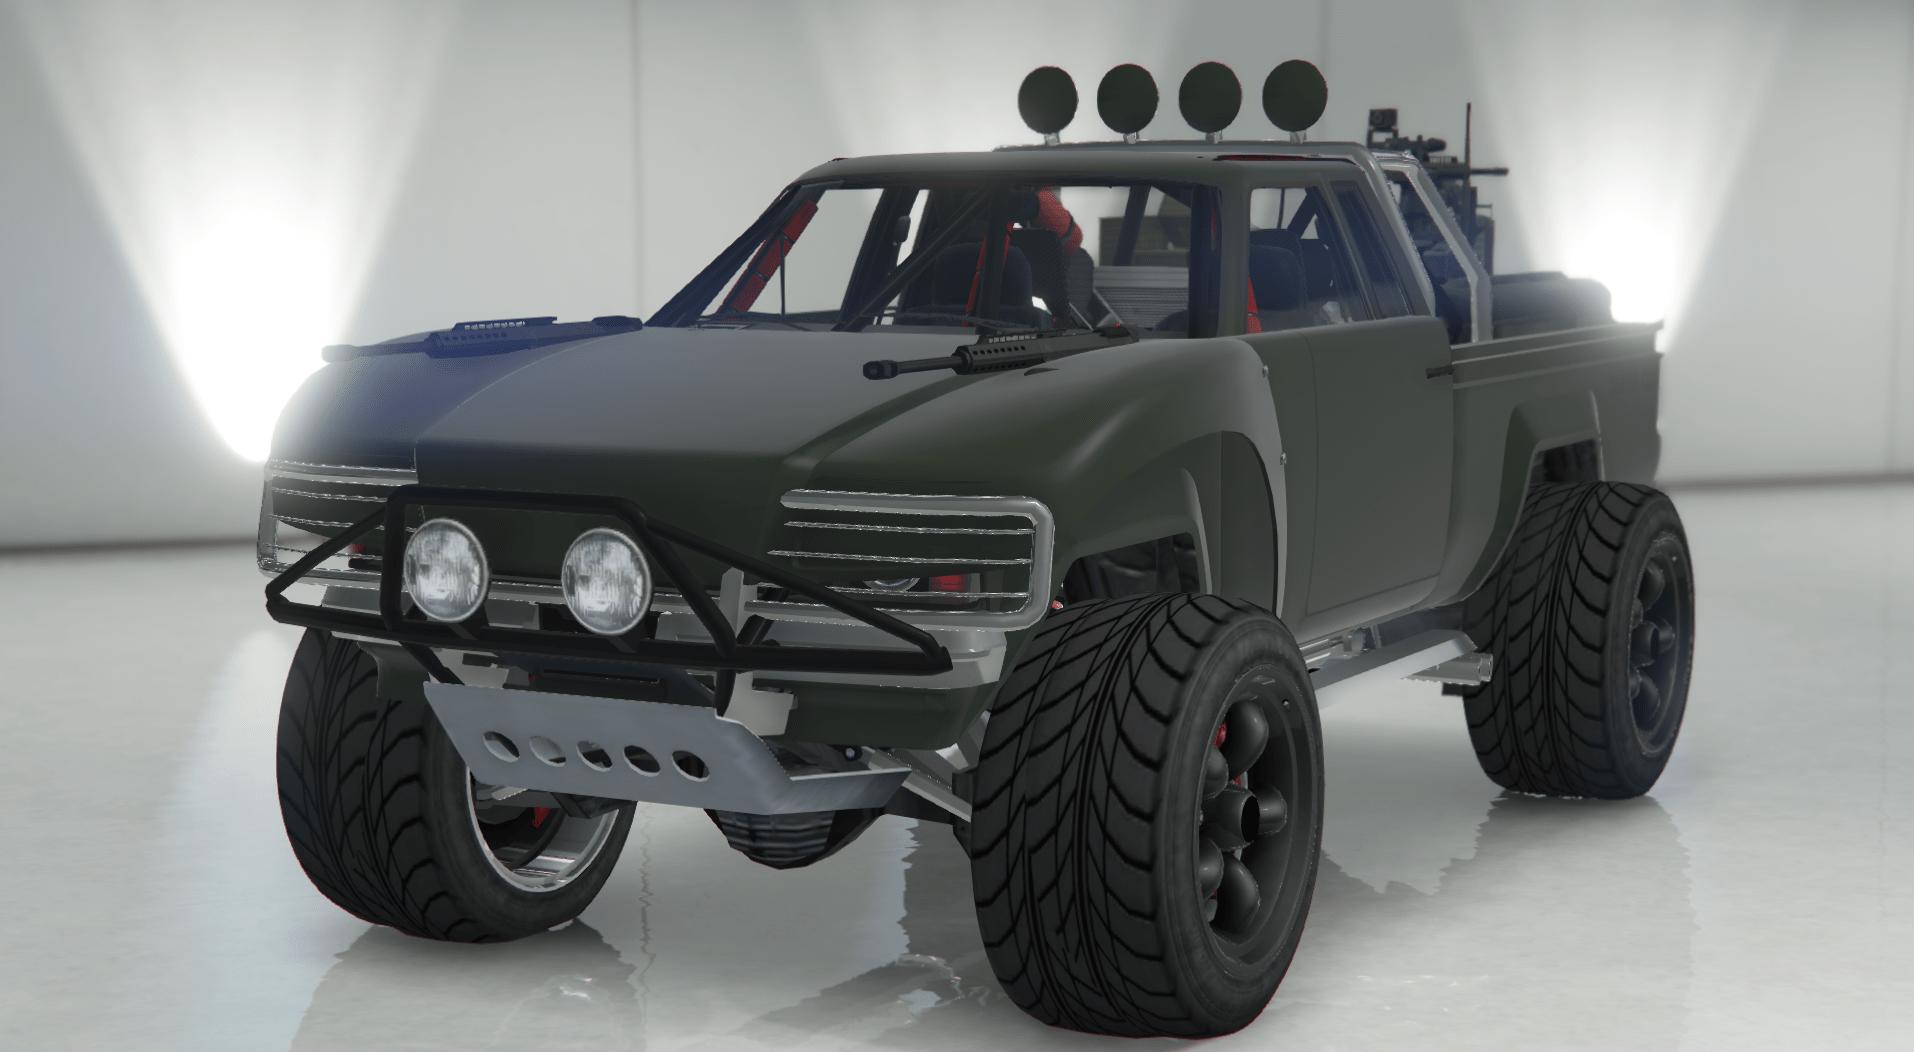 Trophy Truck Gta 5 >> Custom Karin Rebel Trophy Truck [Menyoo] - GTA5-Mods.com